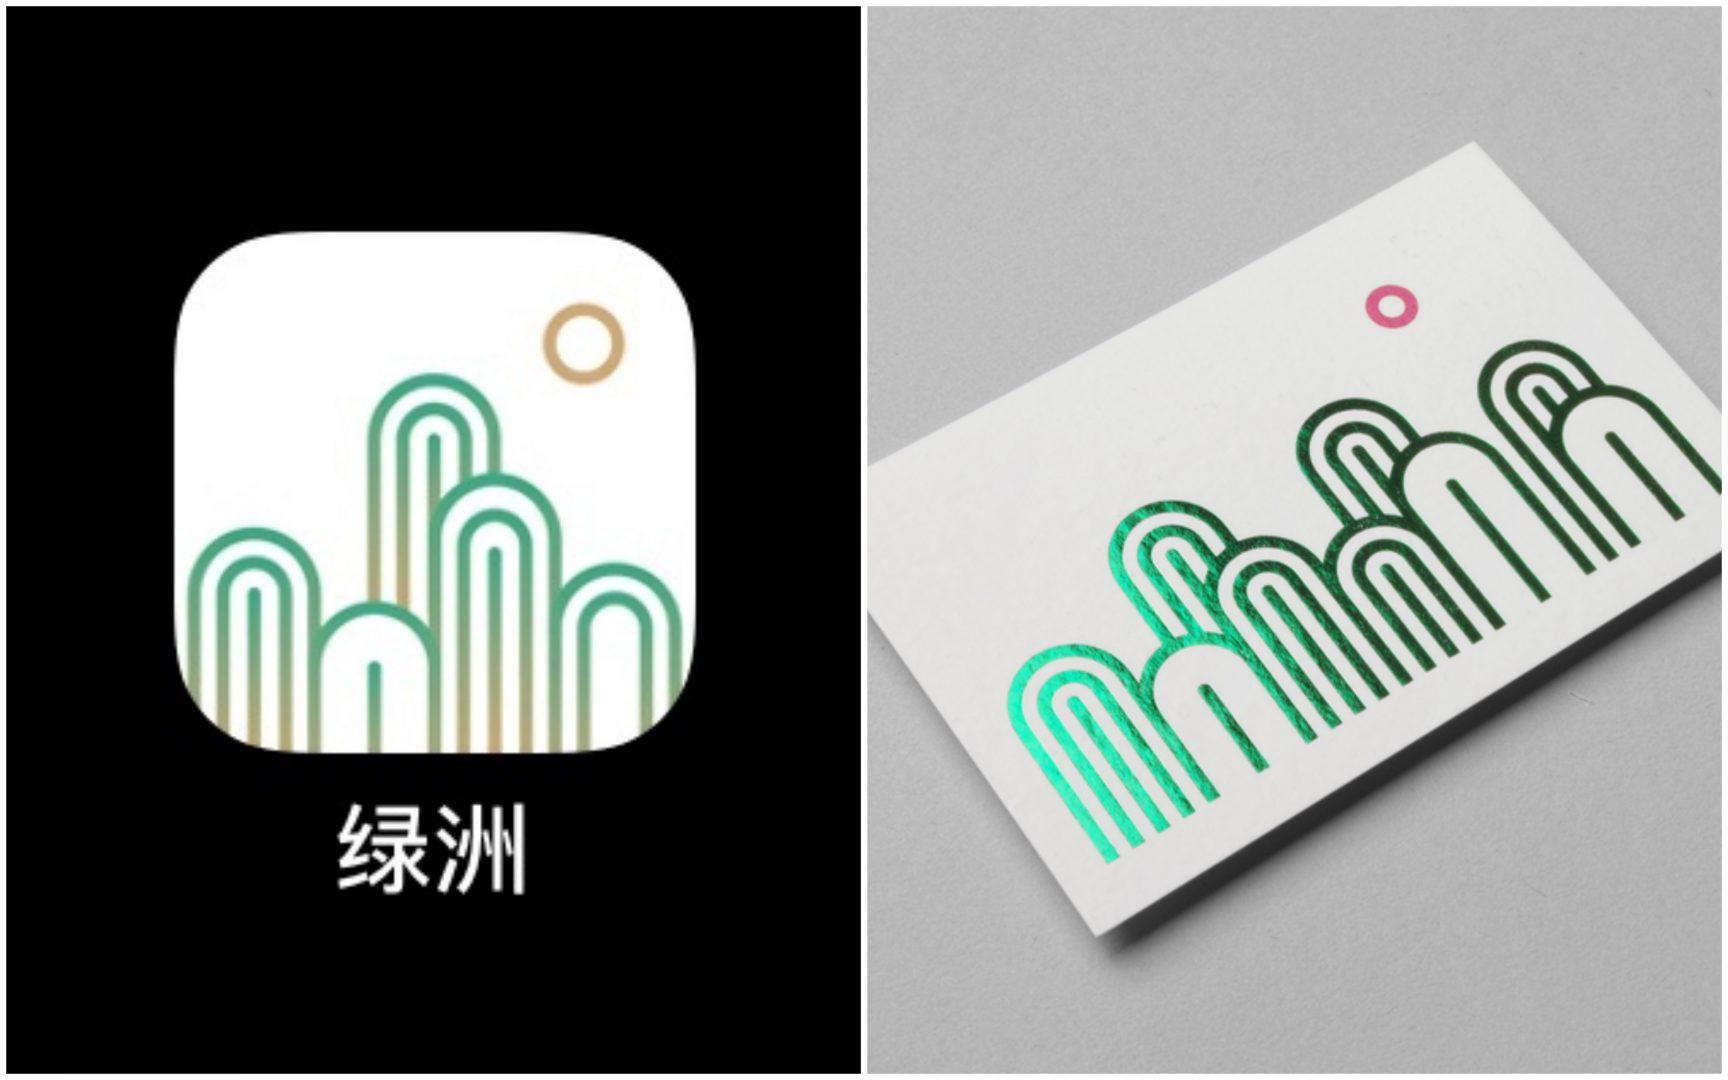 Weibo pulls Instagram-like social app Oasis from app stores